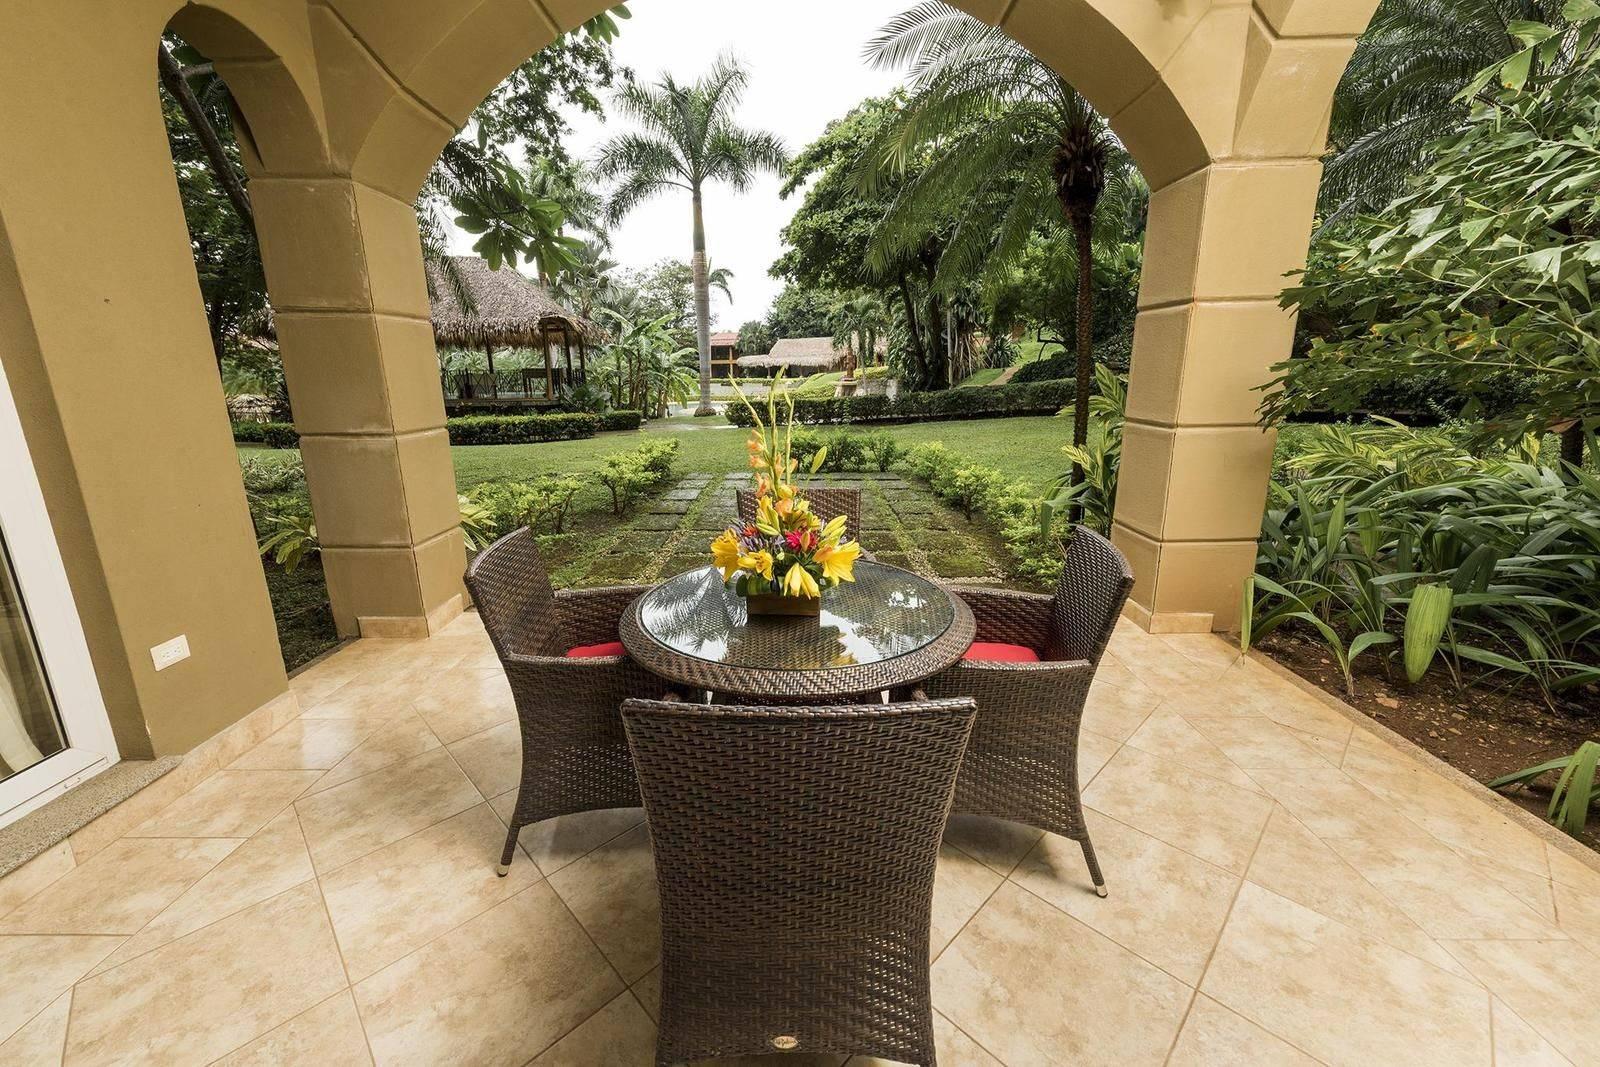 Matapalo 103-Luxury 2 BR Poolside Condo At The Diria Resort-UNDER CONTRACT!